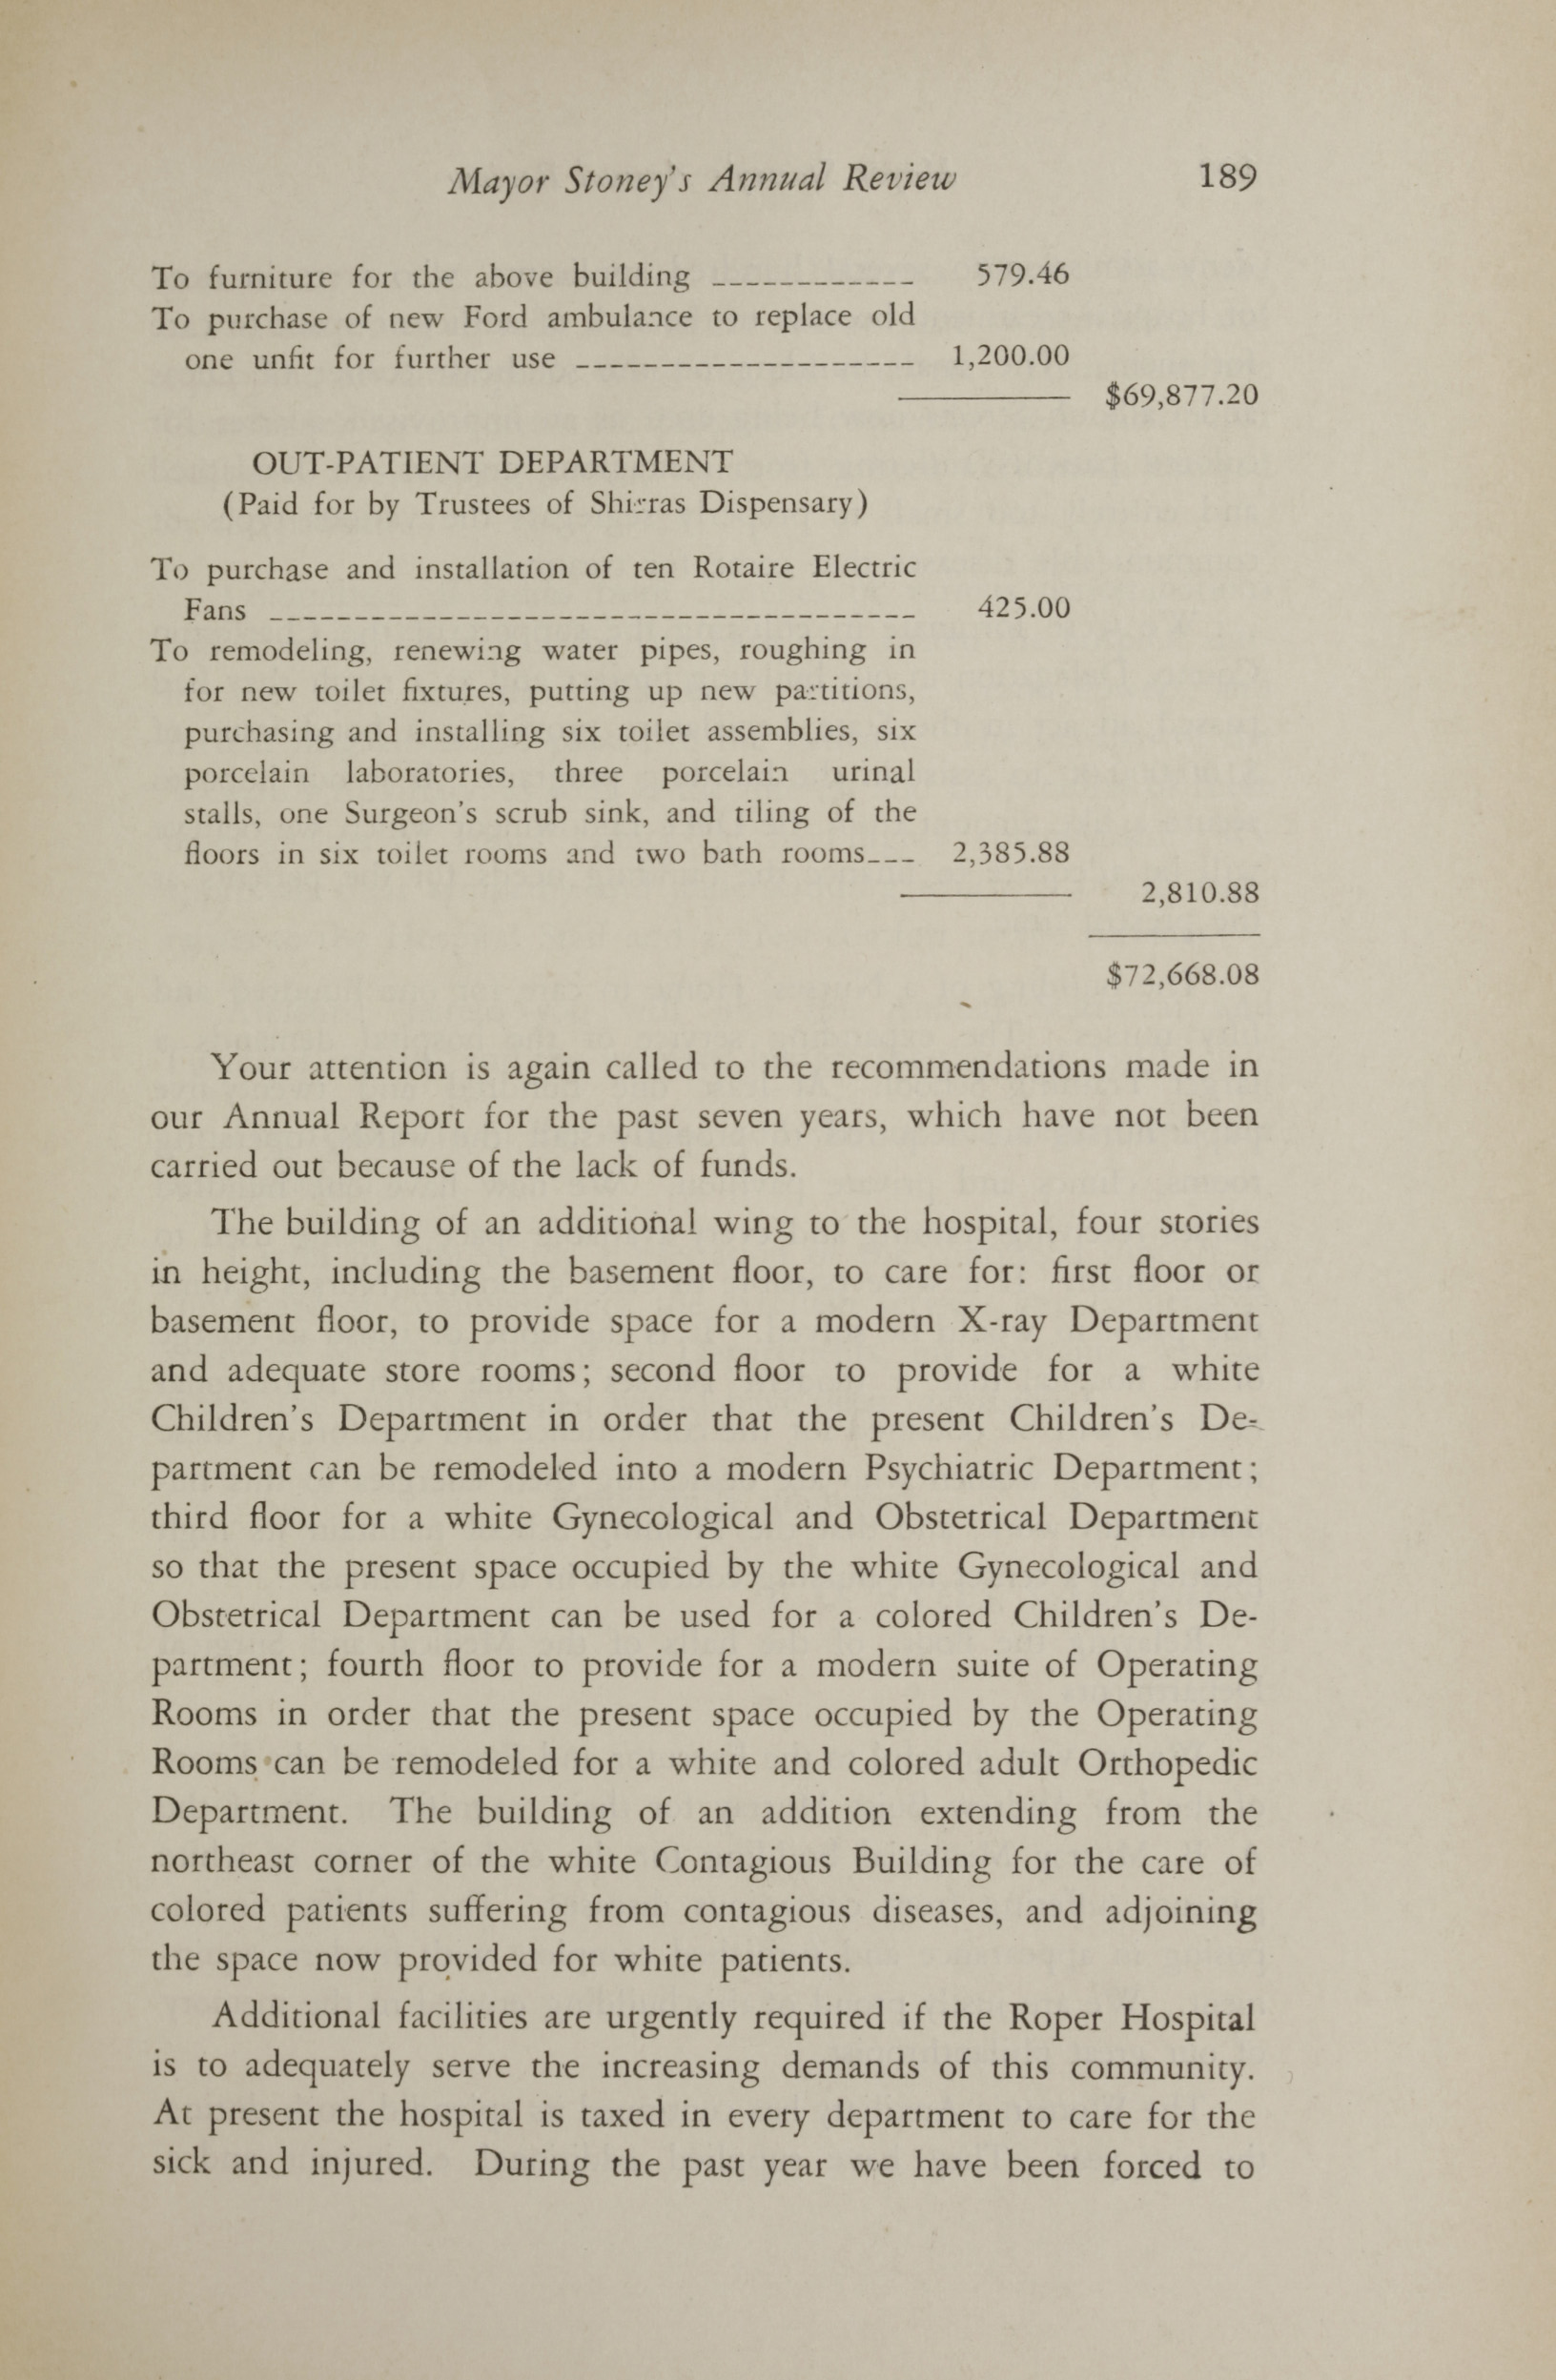 Charleston Yearbook, 1930, page 189